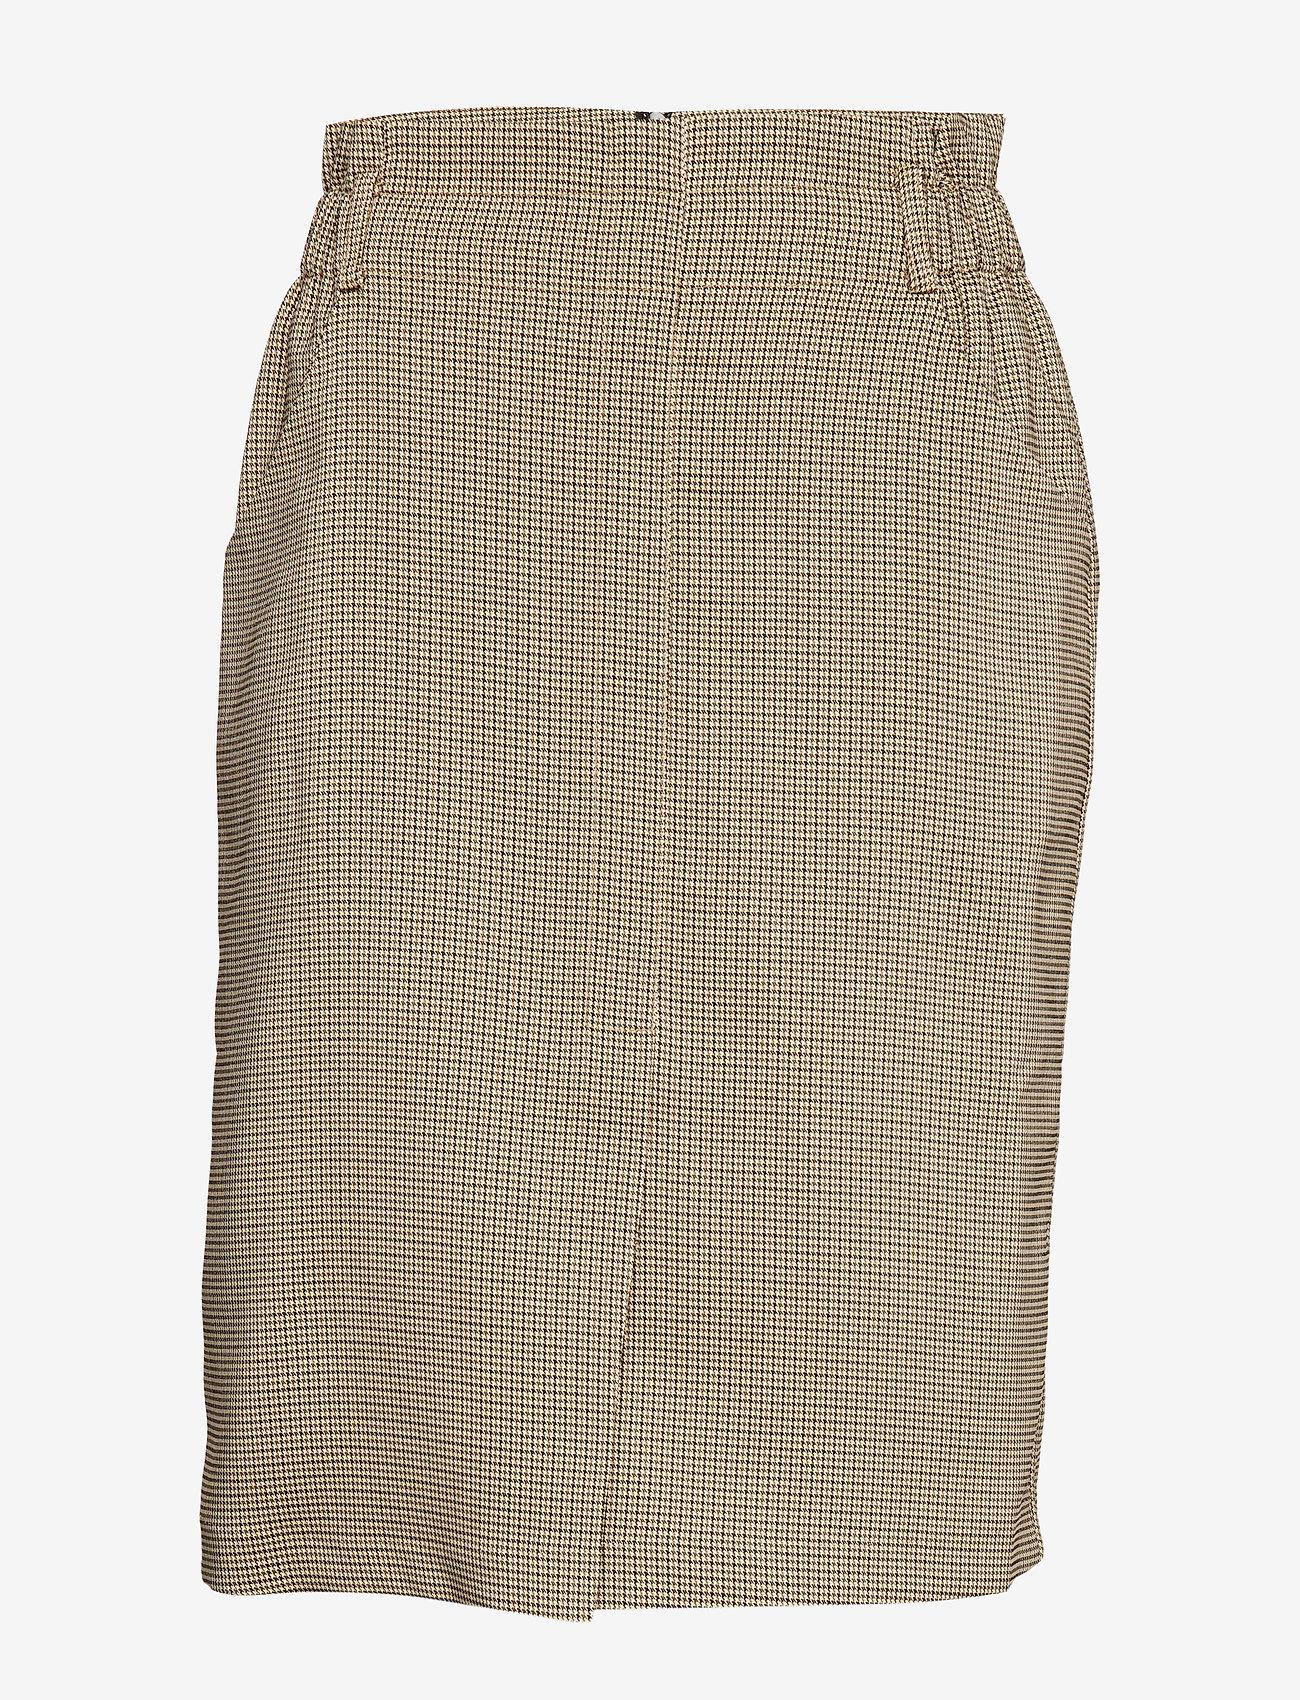 Minus - Lay skirt - midi skirts - houndstooth check - 0